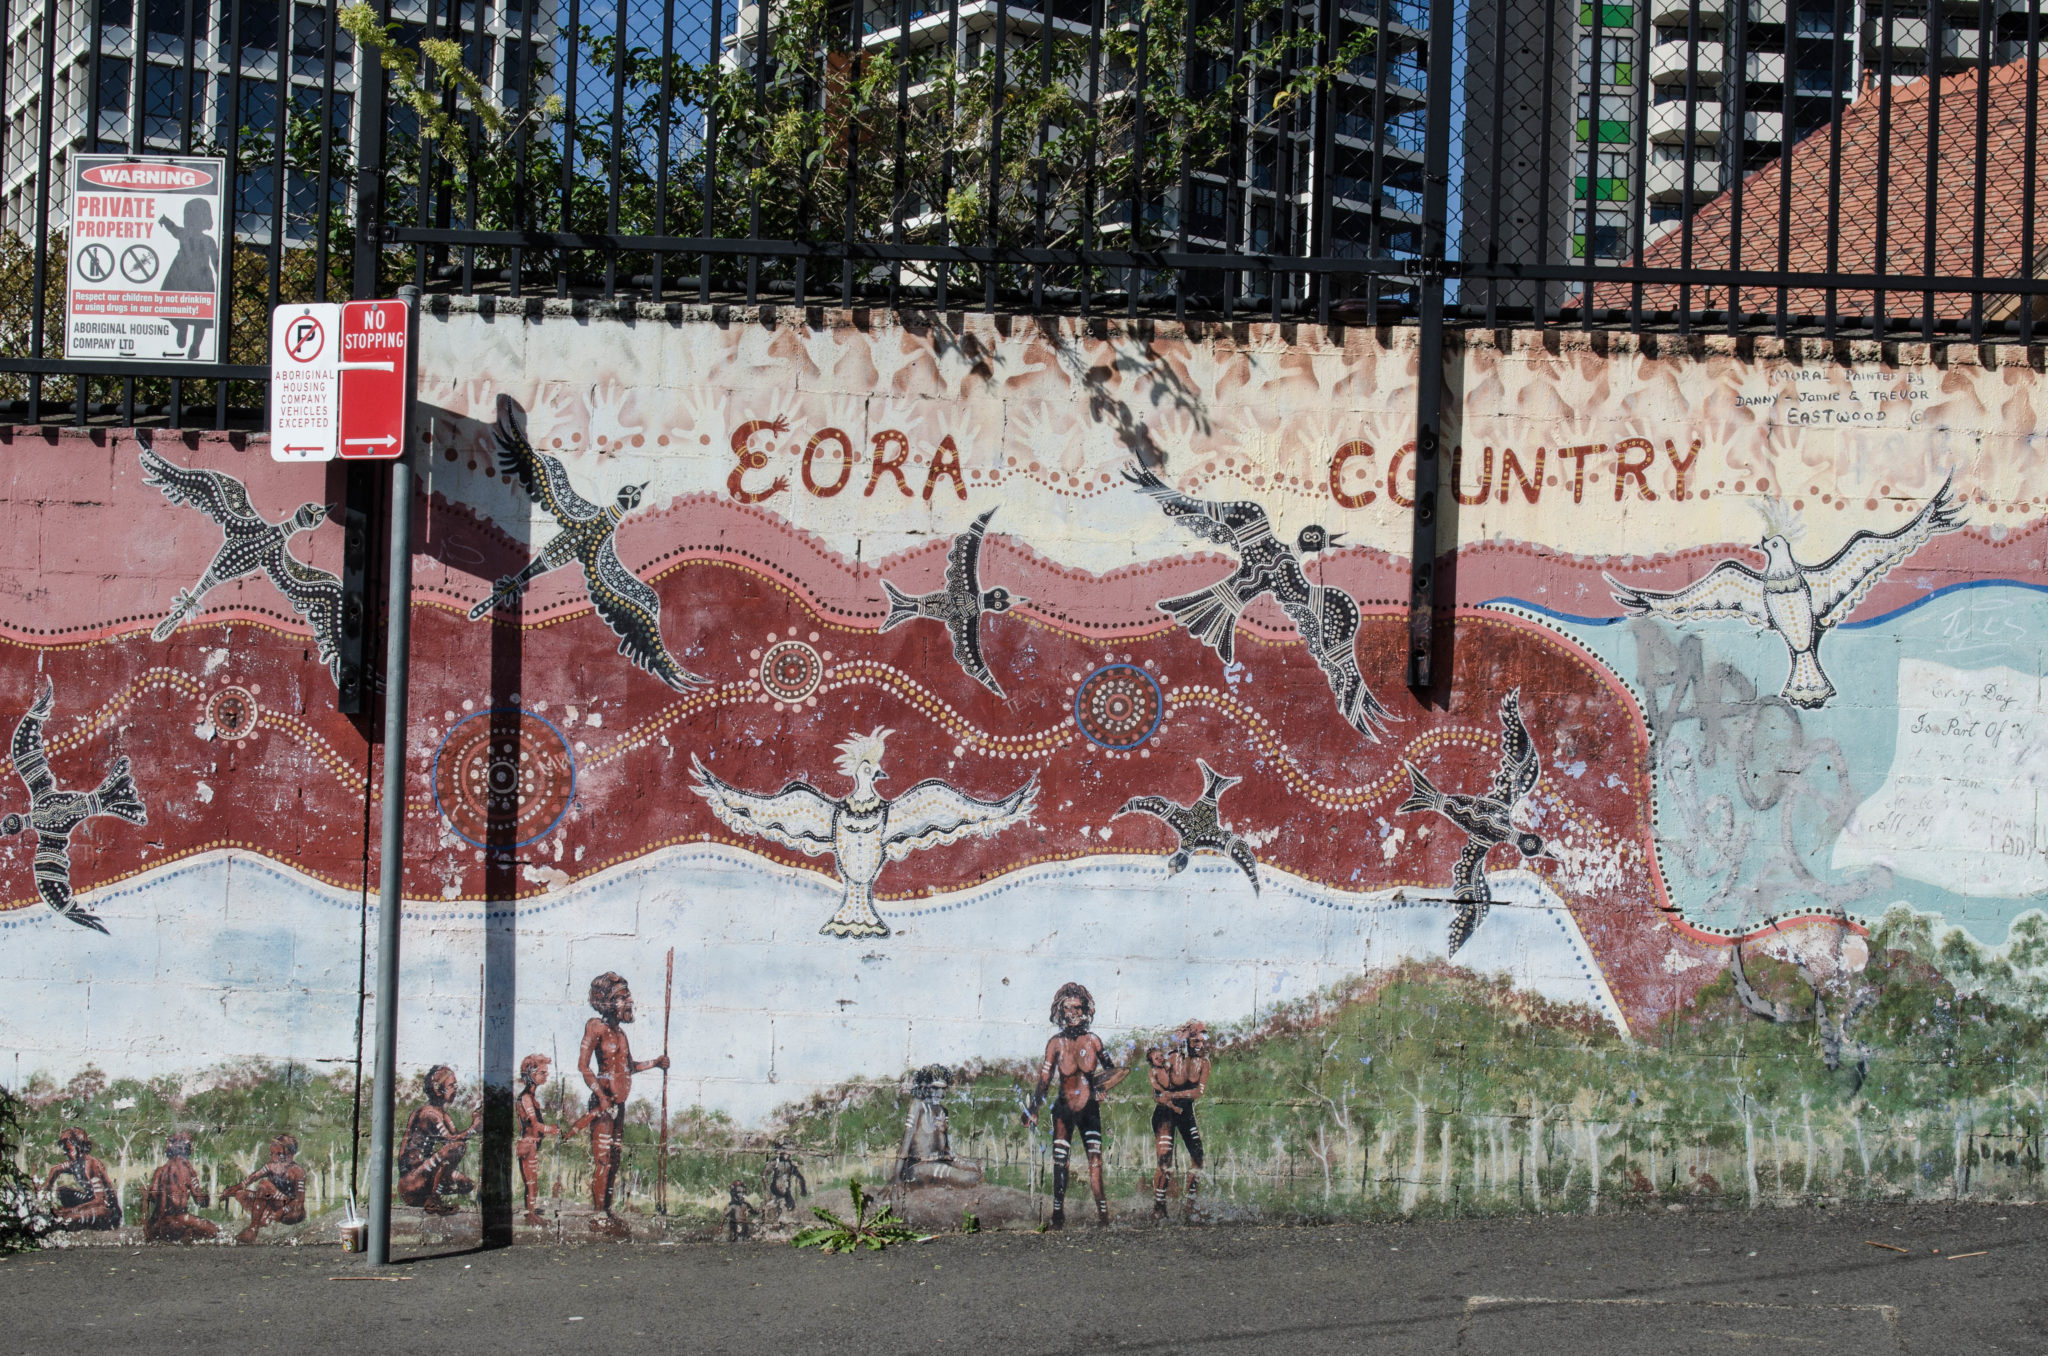 Redfern Sydney: Follow the murals to enter the new Redfern